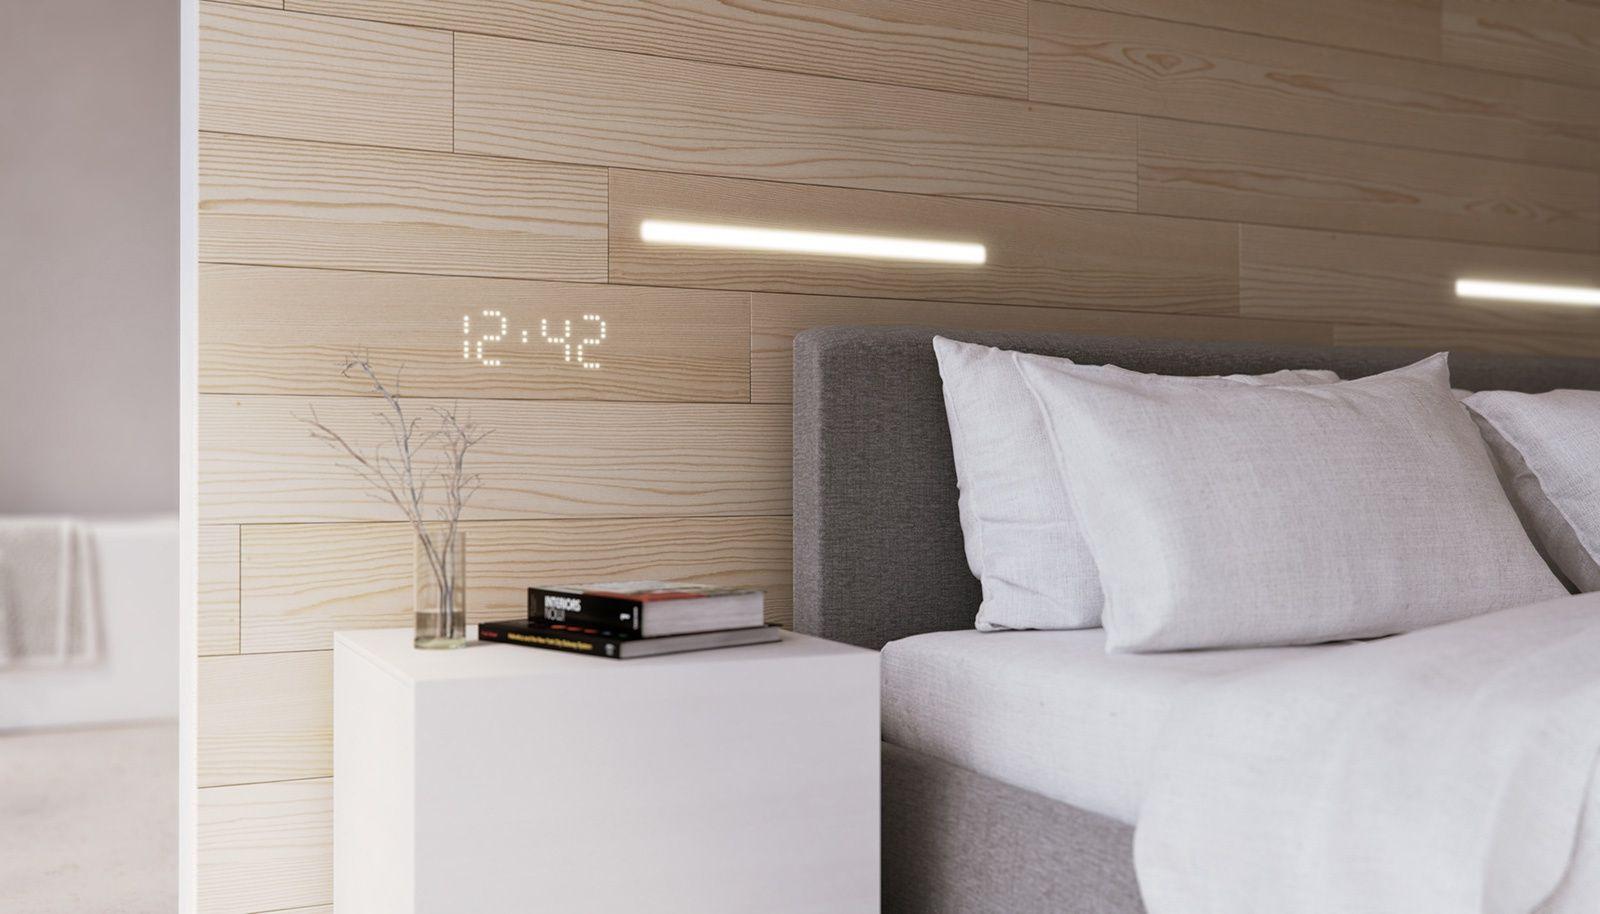 Reloj de luz led en pared